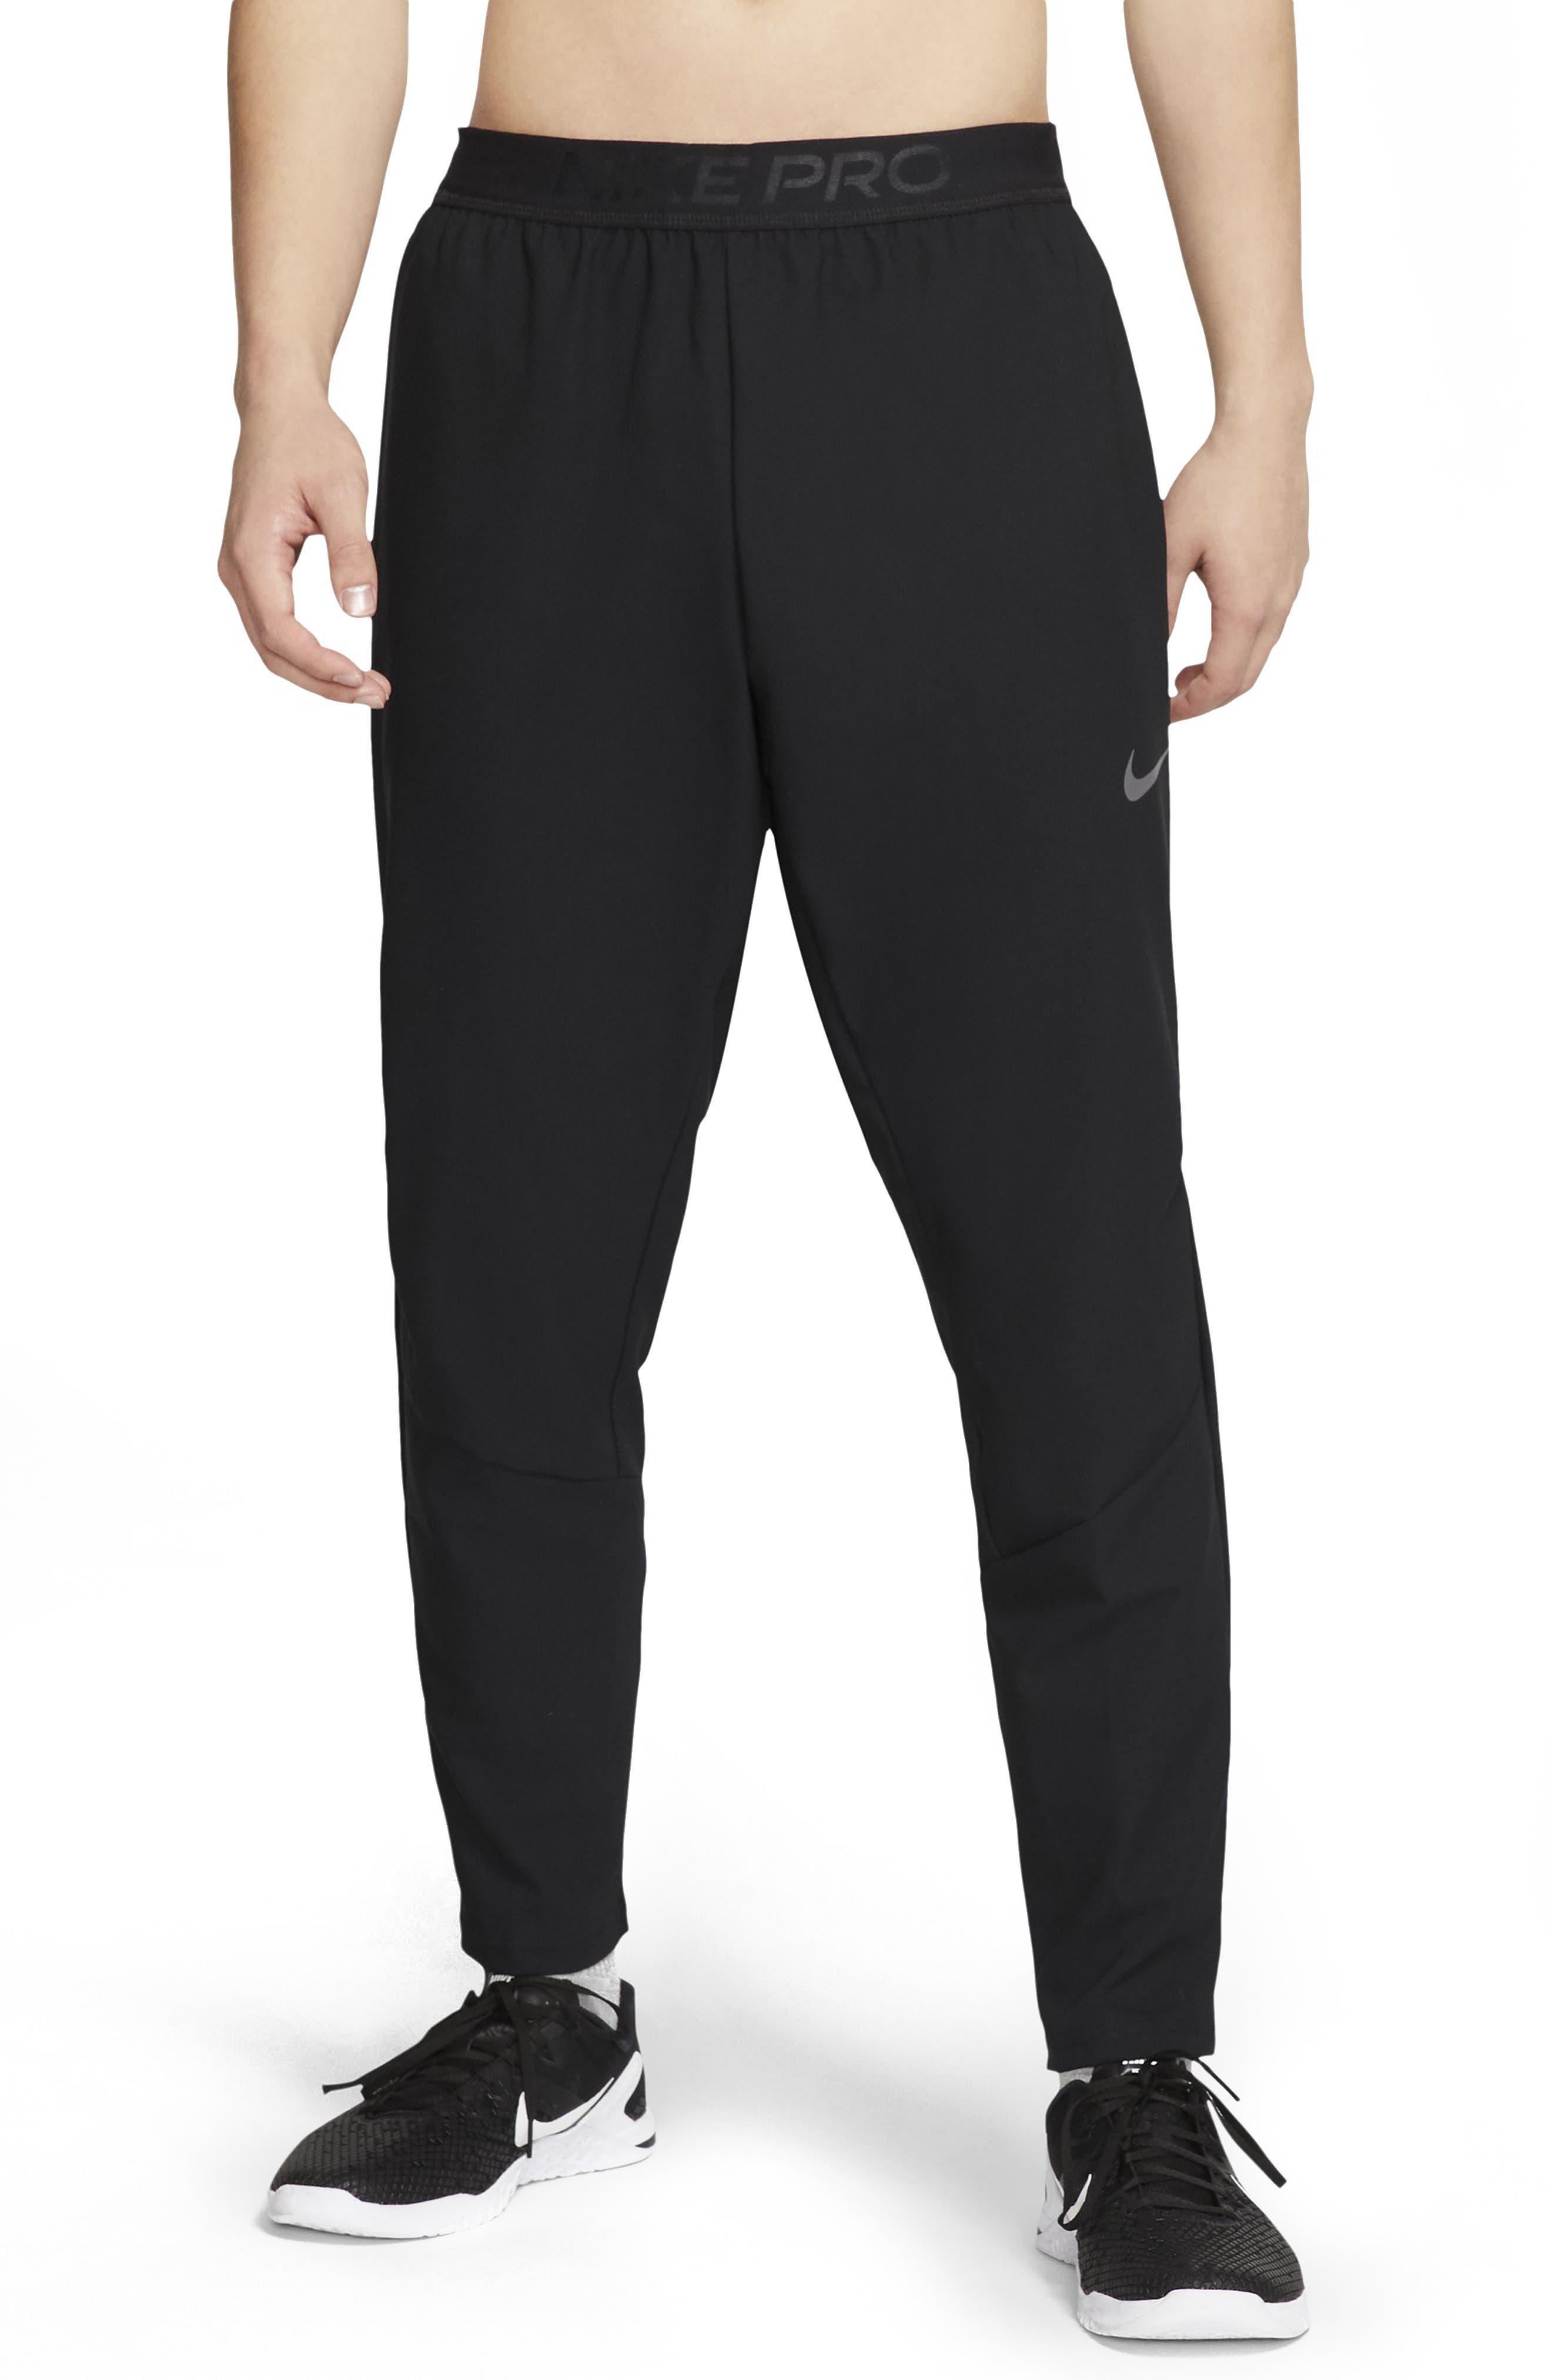 Men's Nike Men's Flex 2.0 Plus Pocket Training Pants